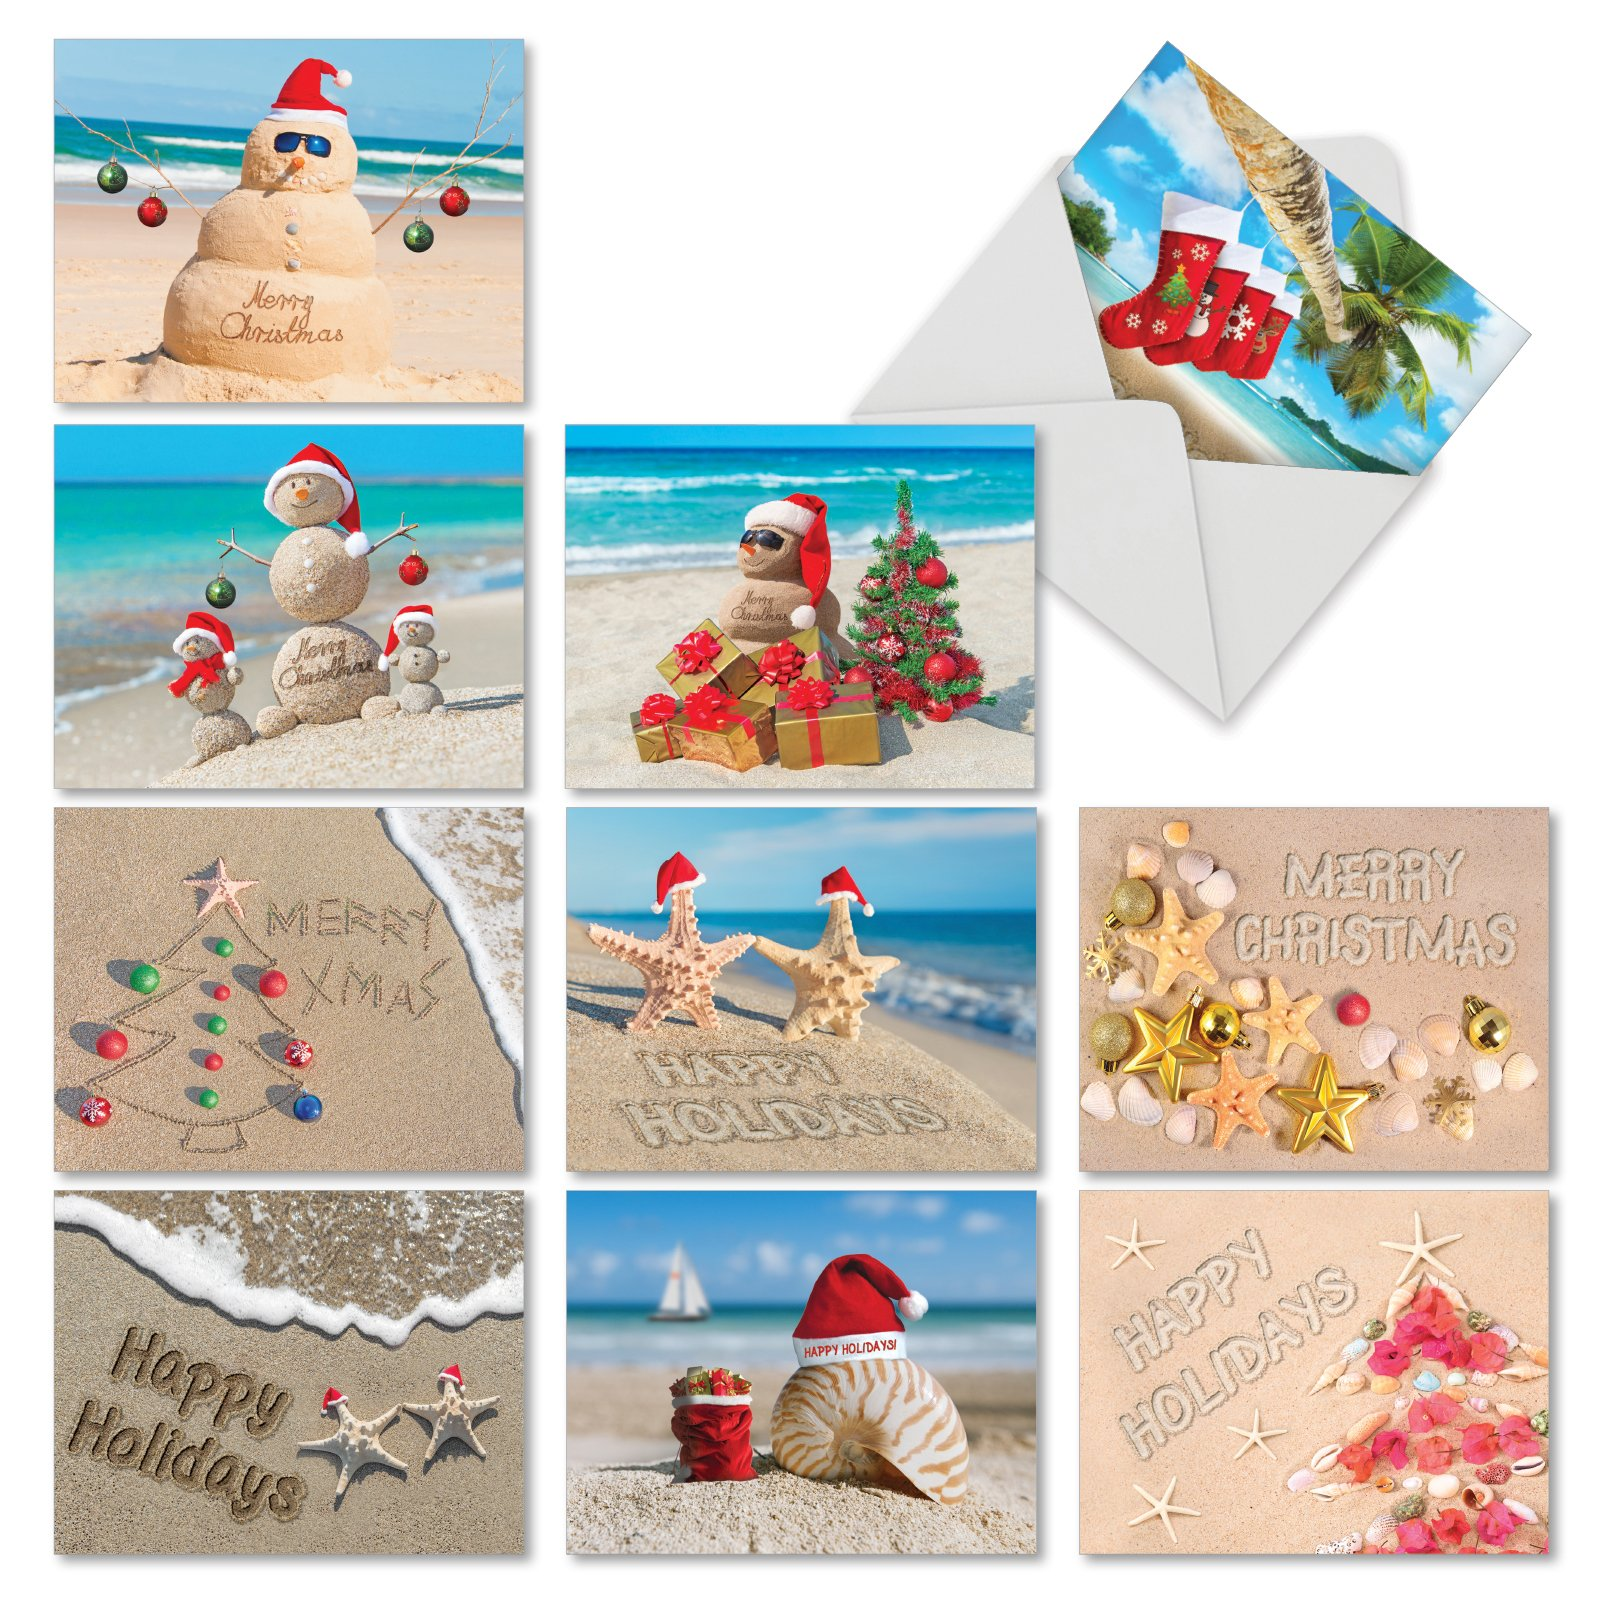 Amazon.com: Ultimate Beach Christmas Card Variety Pack - 36 Beach ...